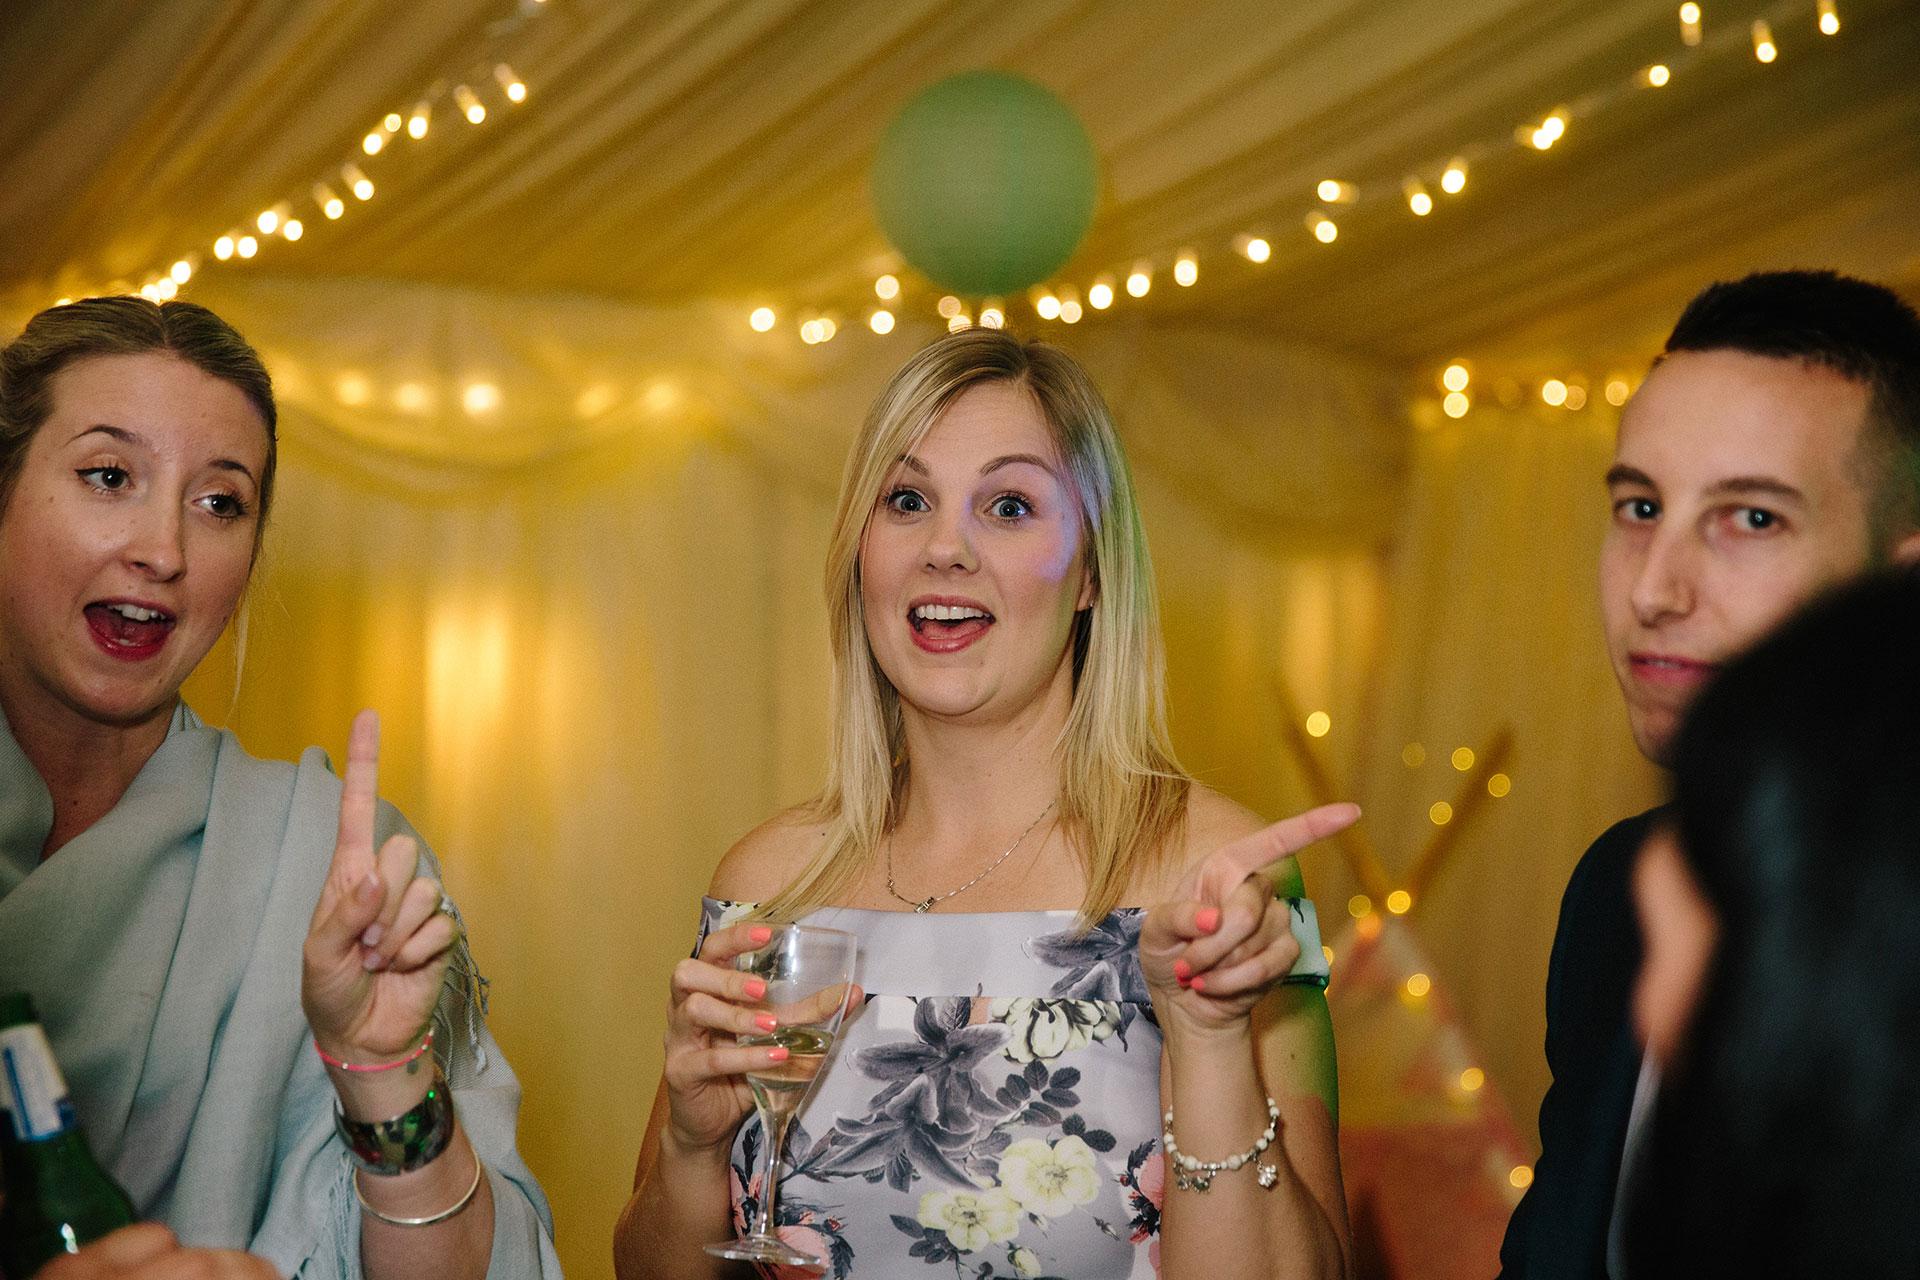 Langar-Hall-wedding-photographer-in-Nottinghamshire-Michael-Newington-Gray-107.jpg